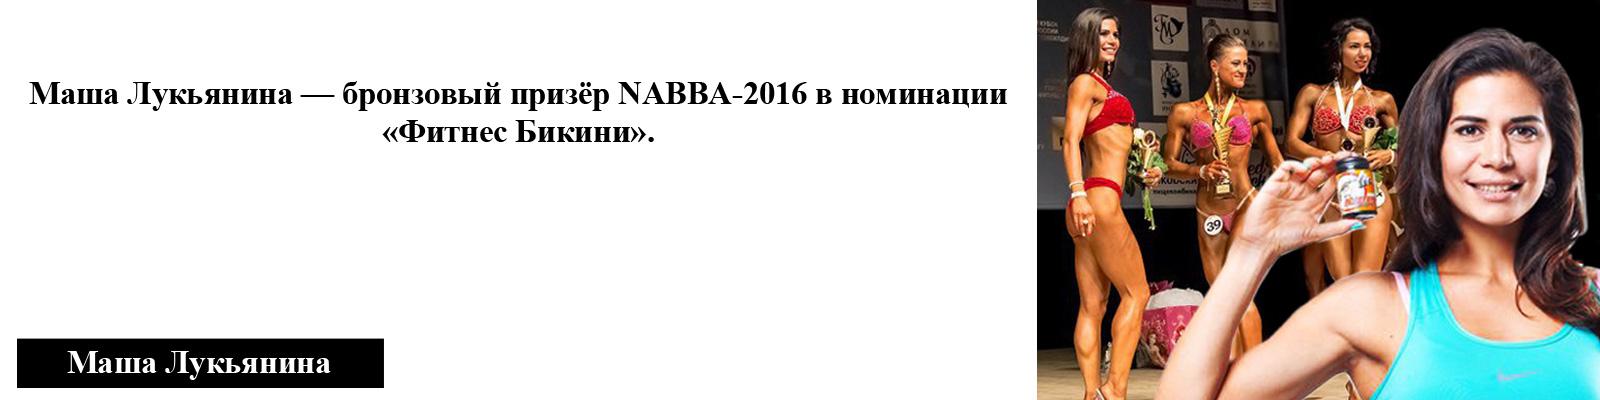 Маша Лукьянина фитнес, бронзовый призер Фитнес Бикини-2016